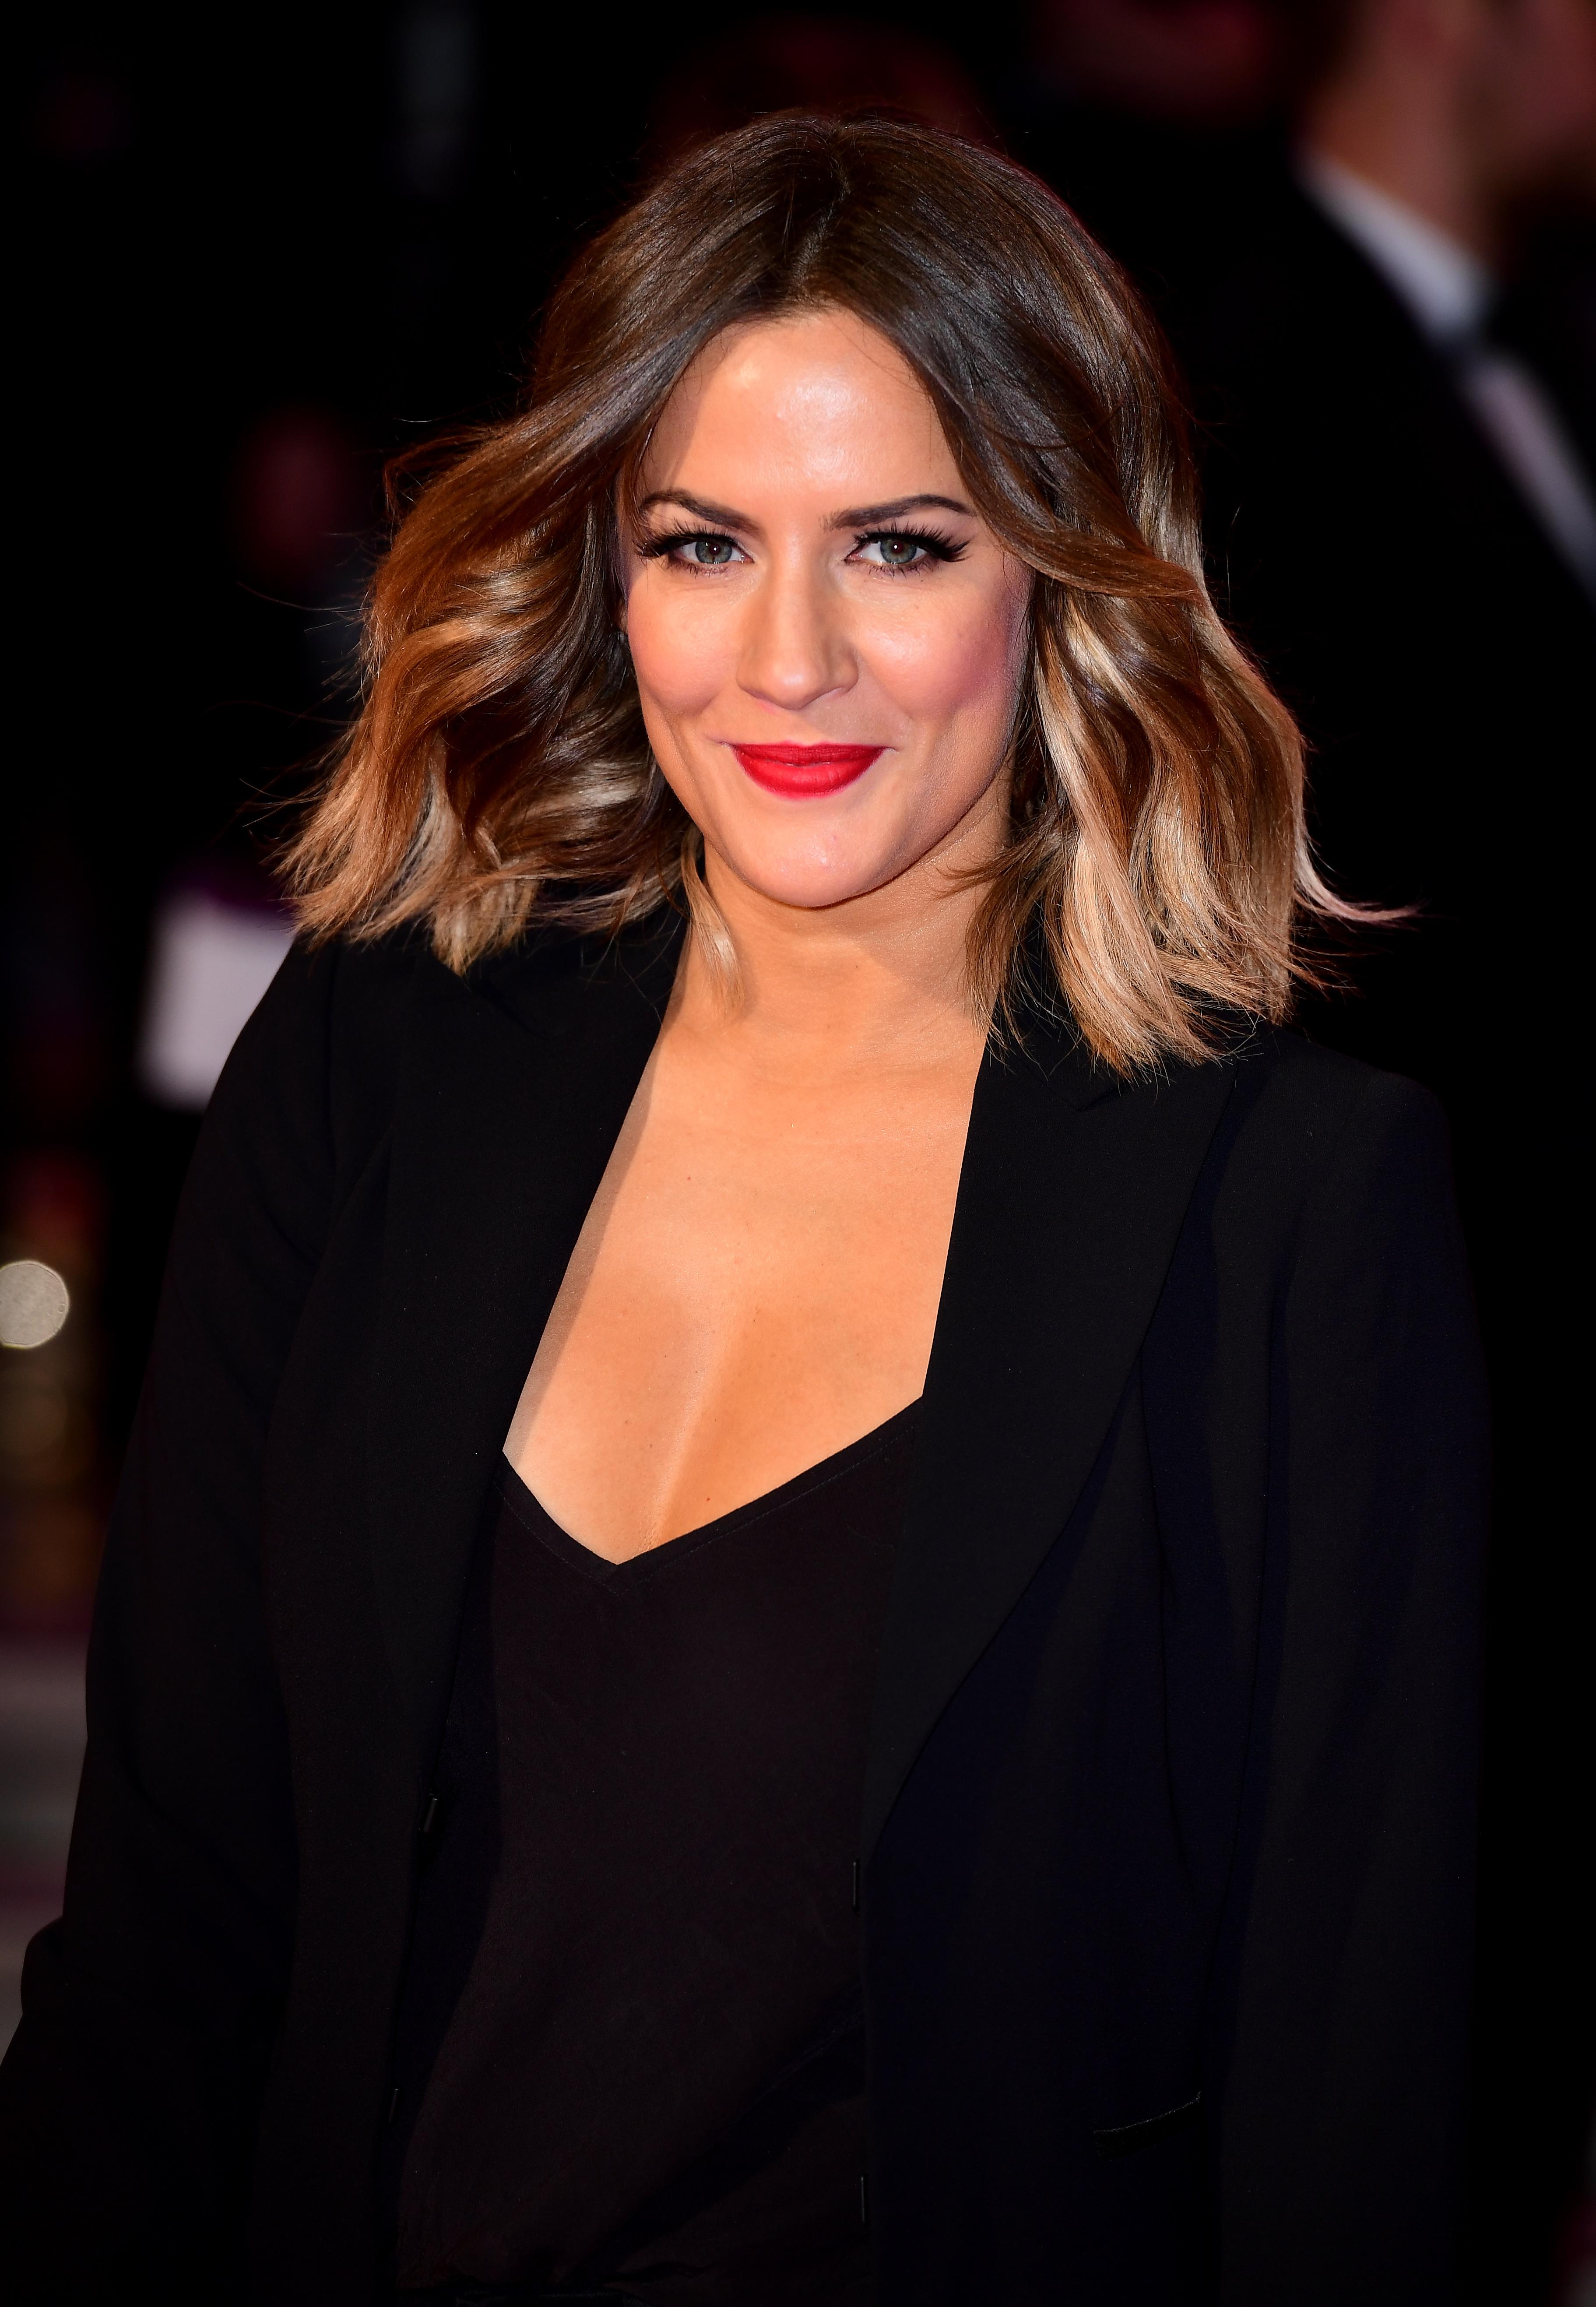 Caroline Flack attending the ITV Gala at the London Palladium.